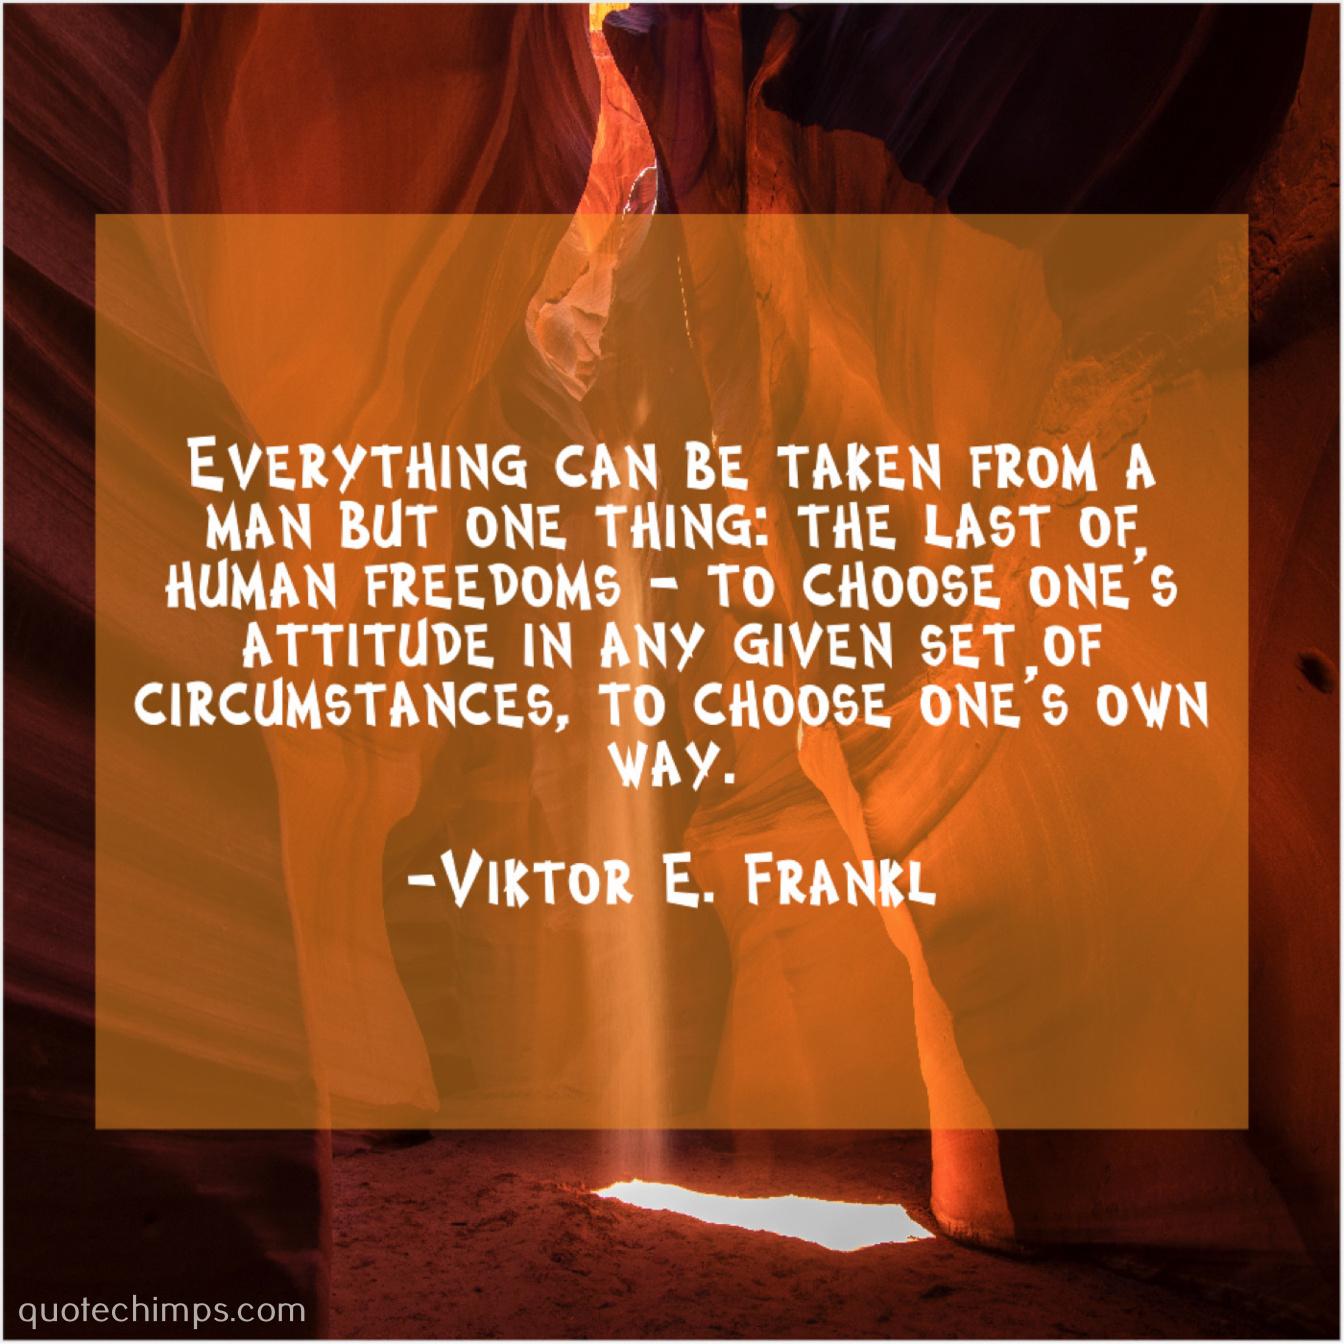 Viktor E Frankl Quote Chimps